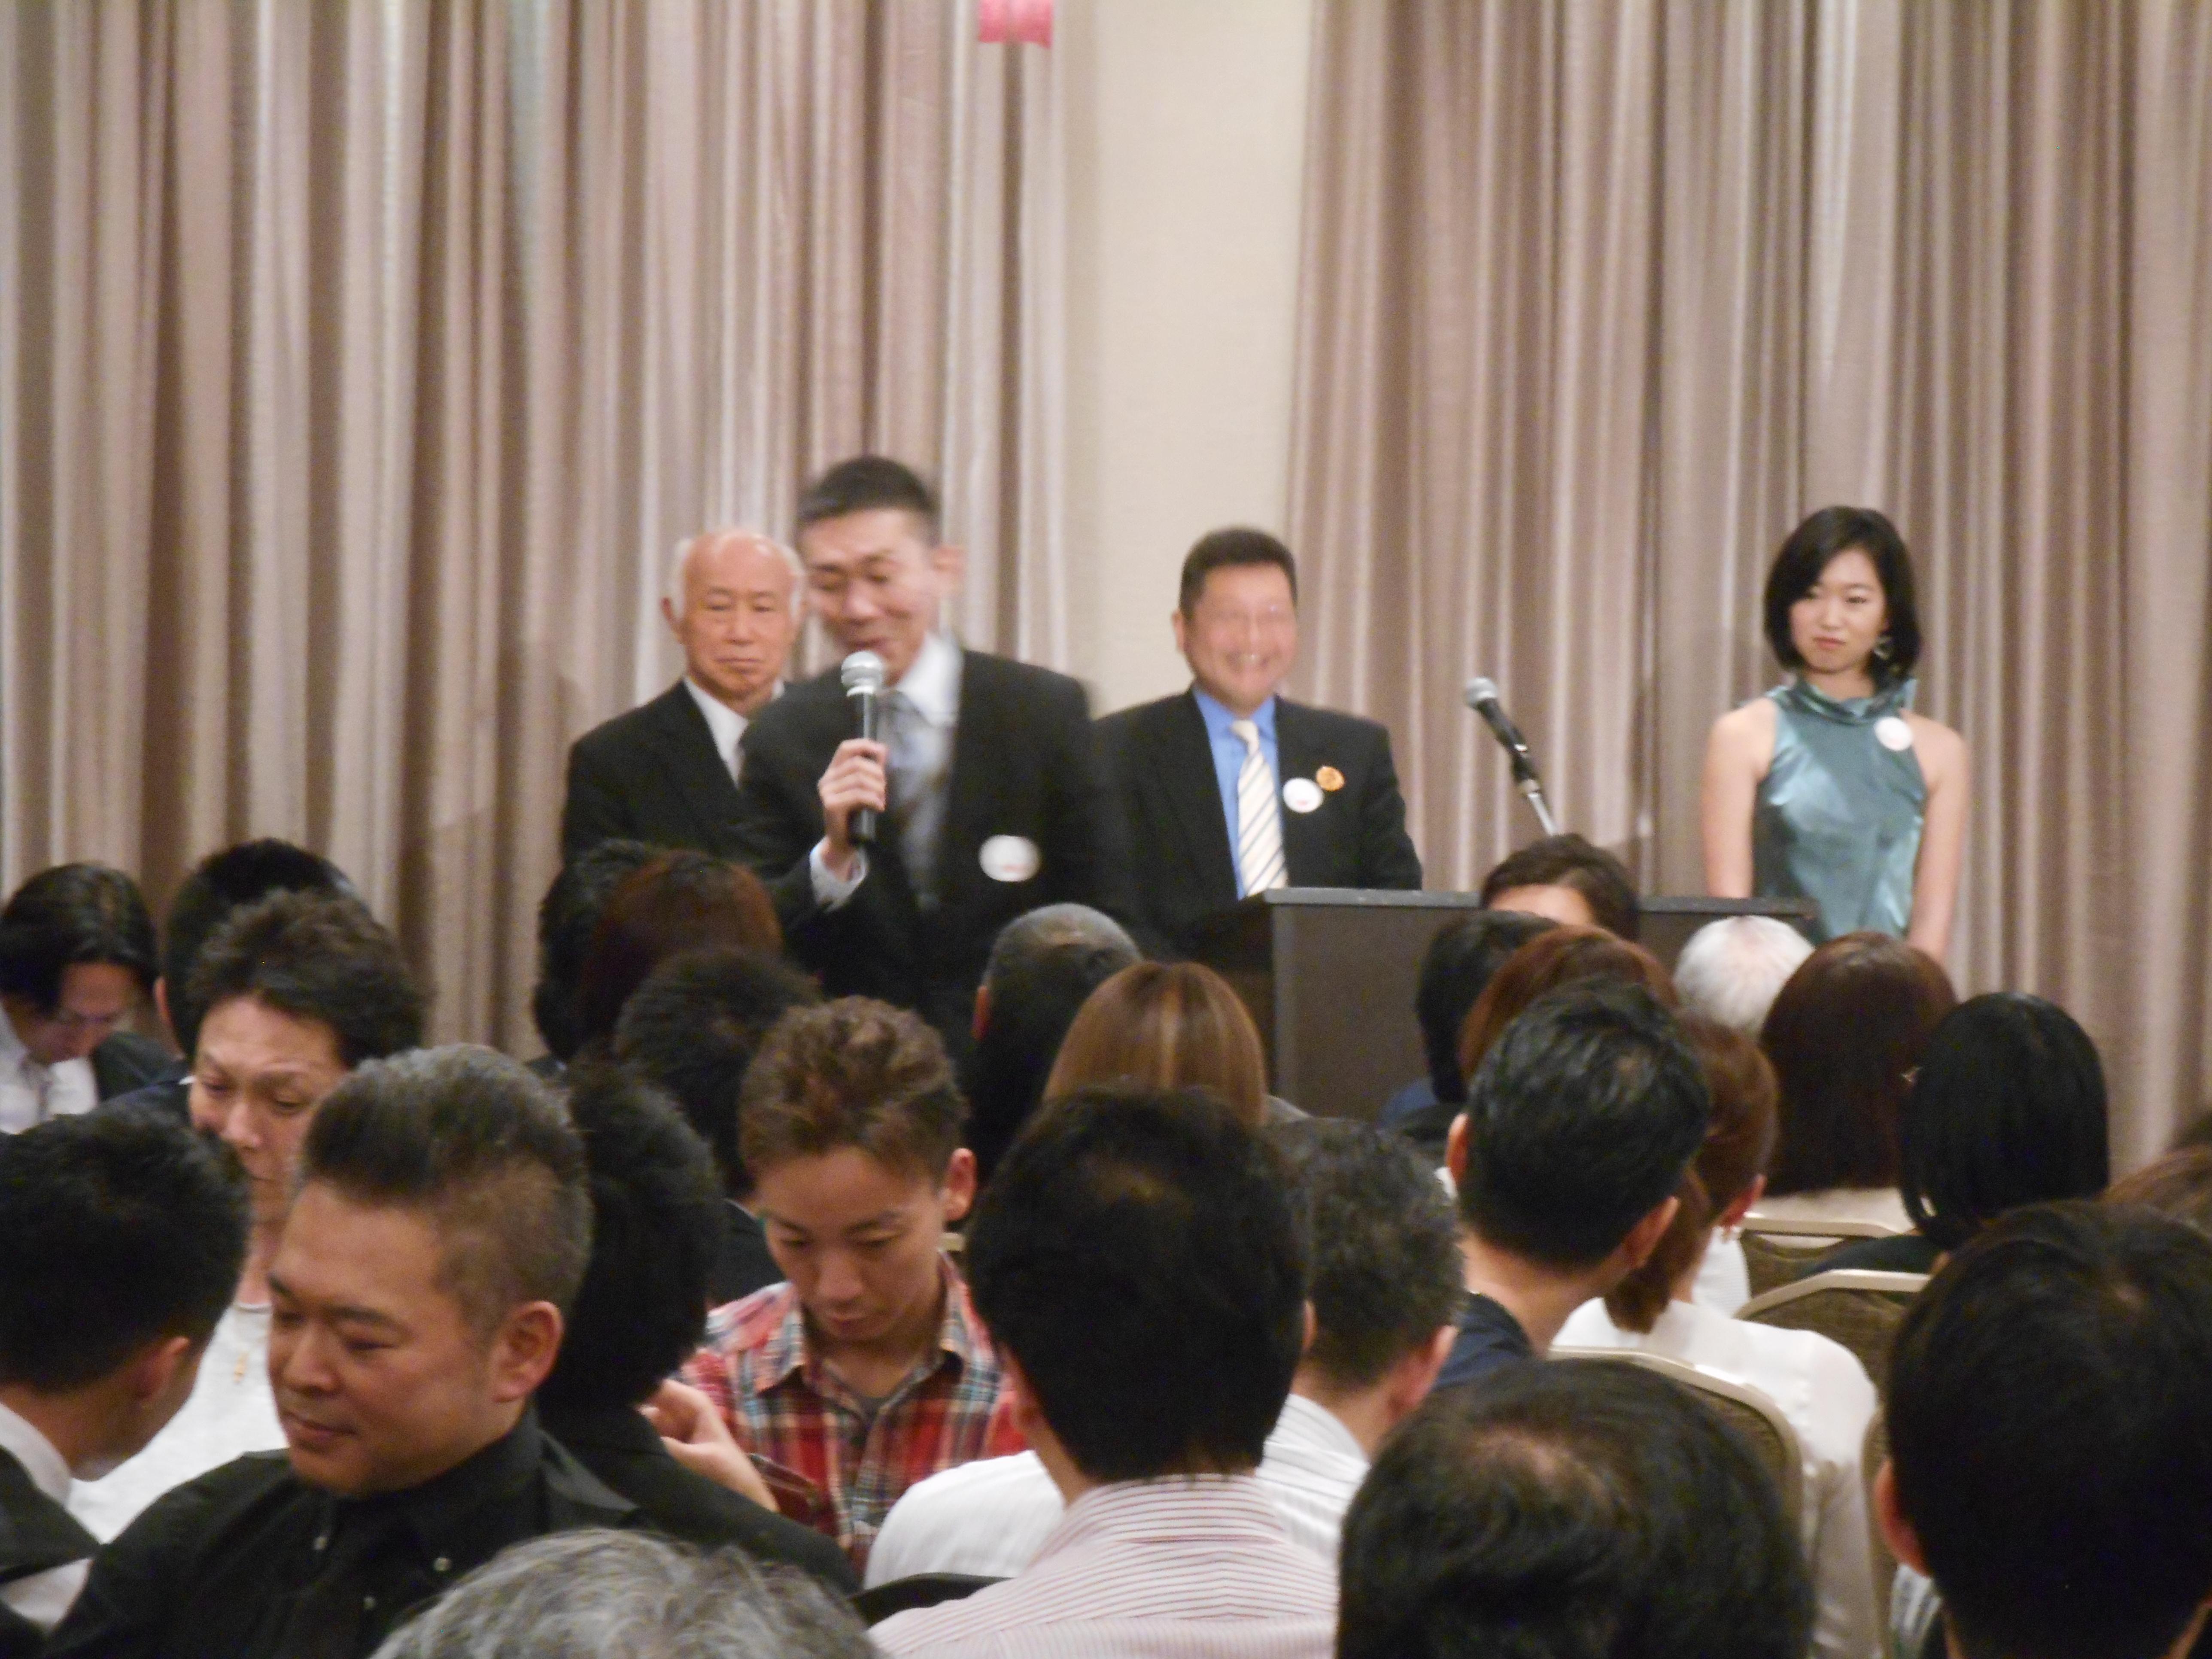 DSCN2110 - 平成30年度 東京思風塾 4月7日(土)「時代が問題をつくり、問題が人物をつくる」